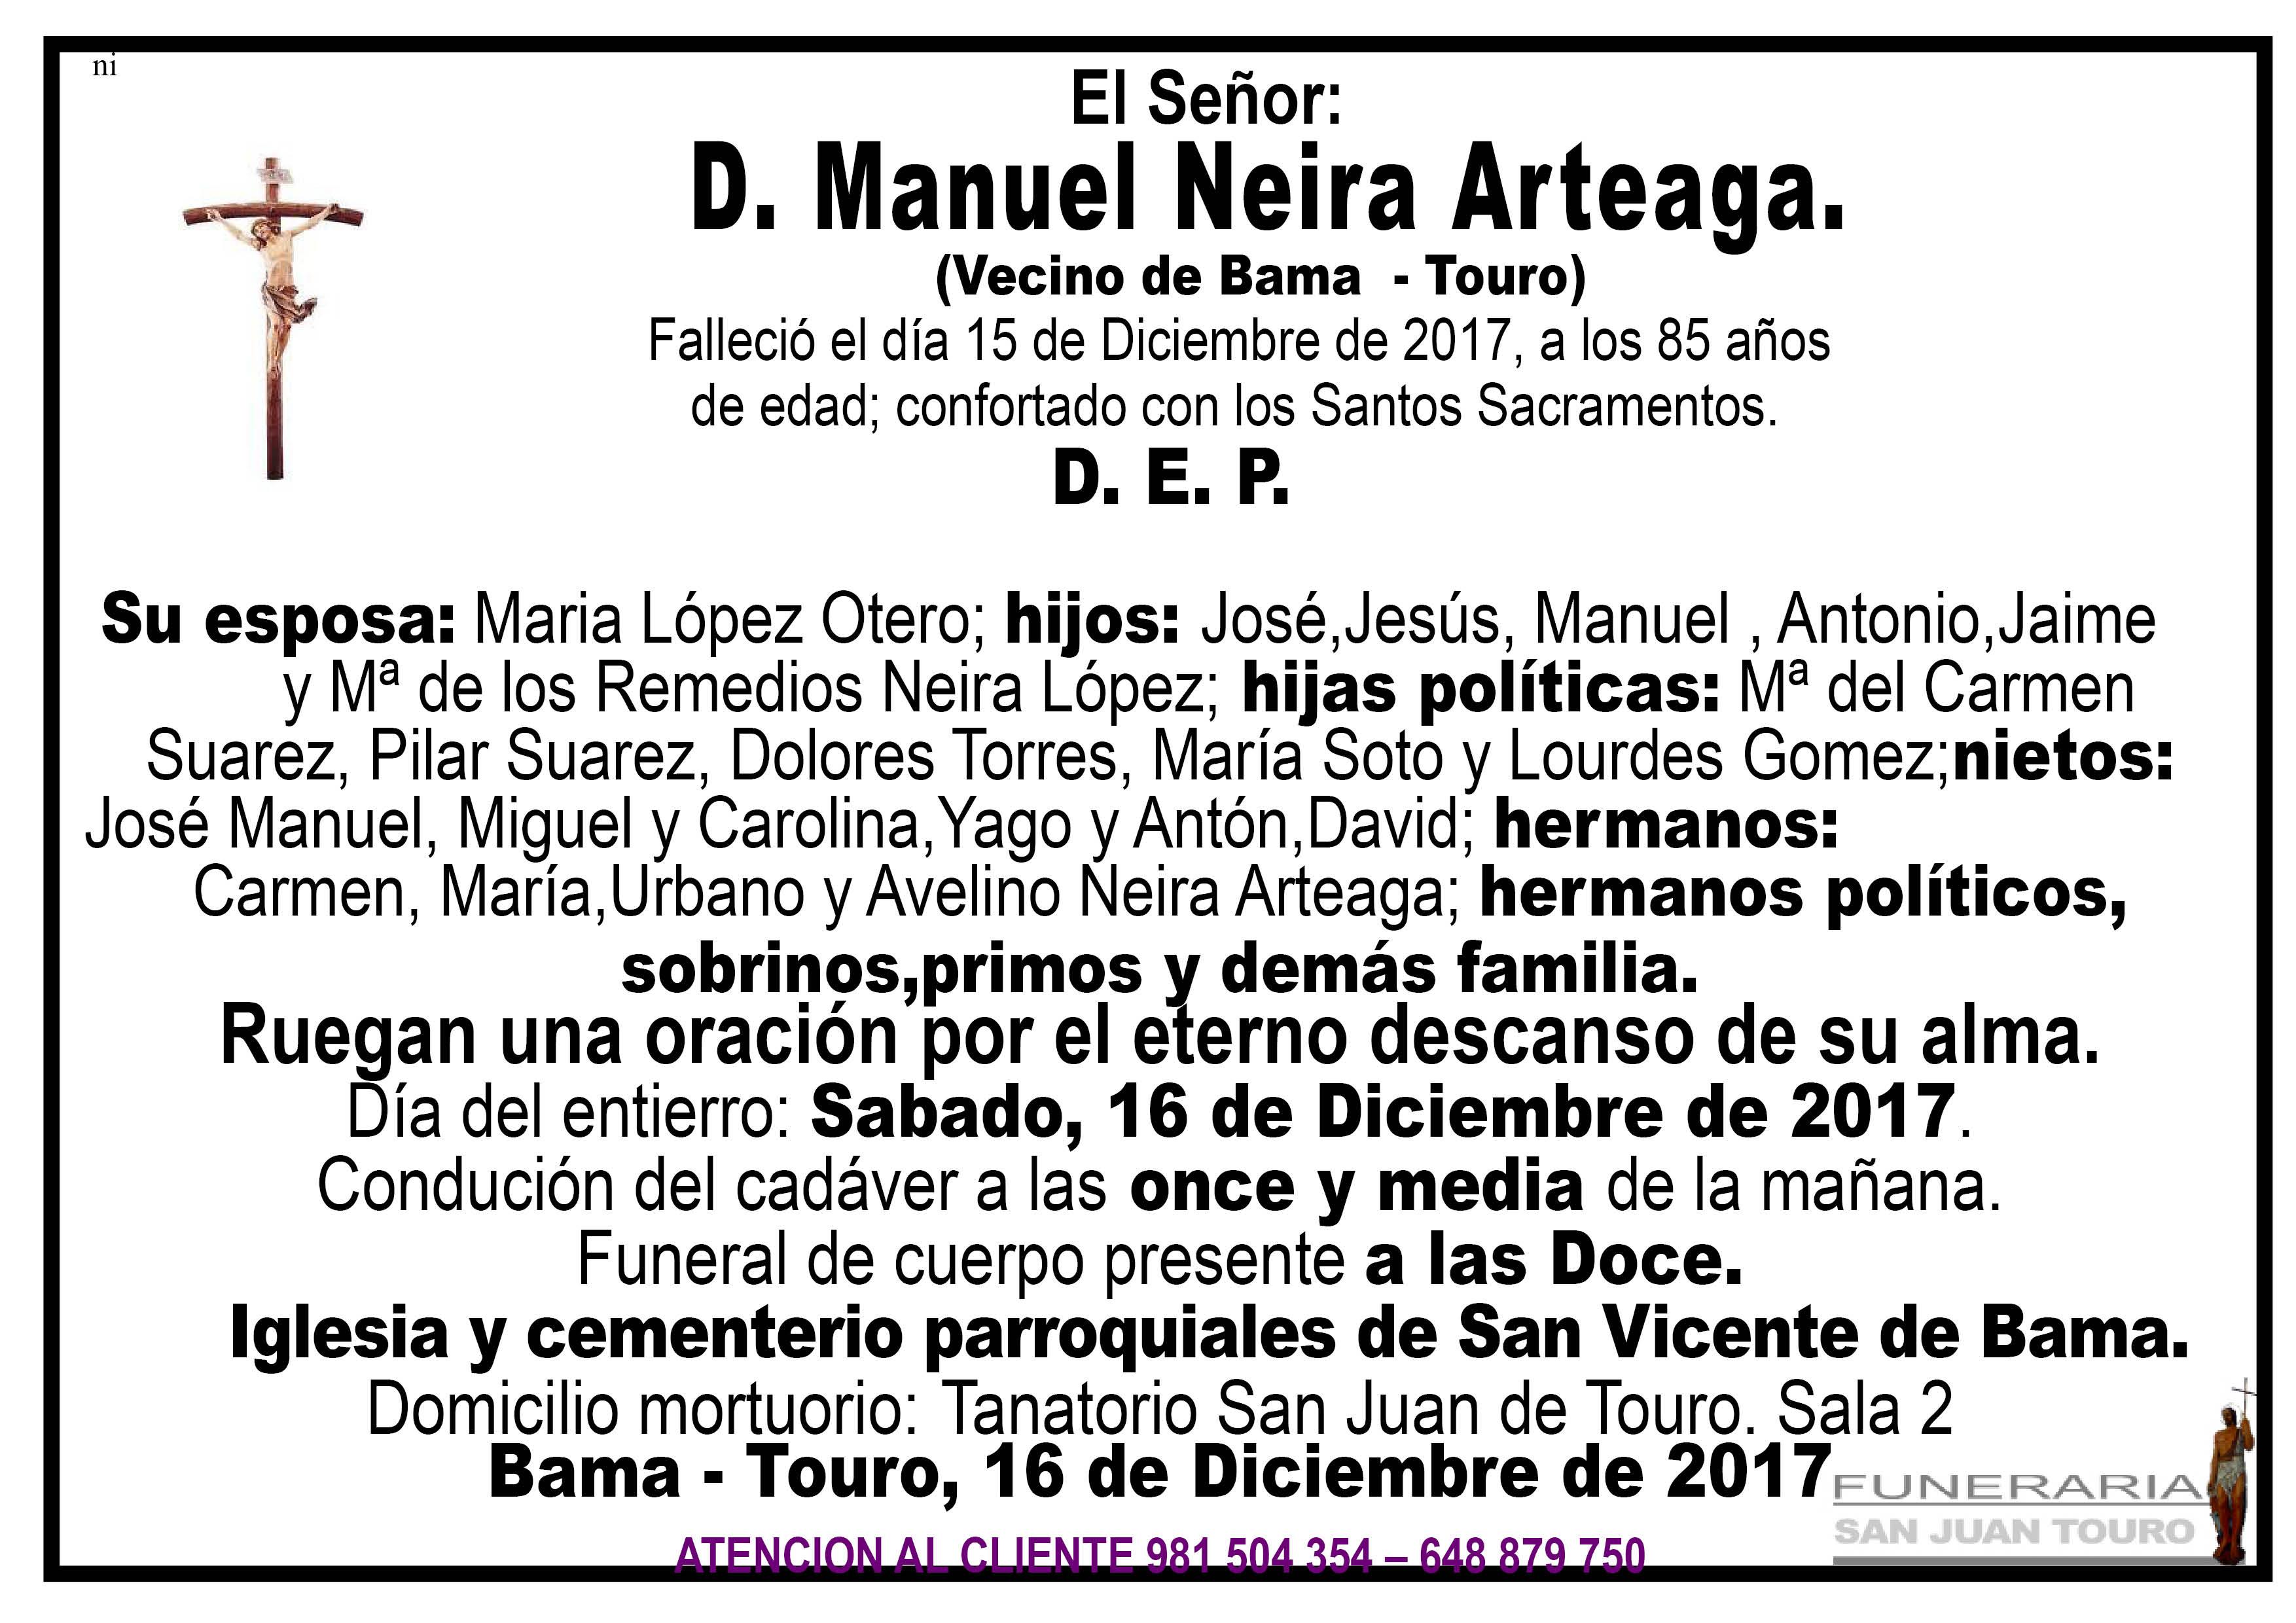 Esquela de SEPELIO DE D. MANUEL NEIRA ARTEAGA